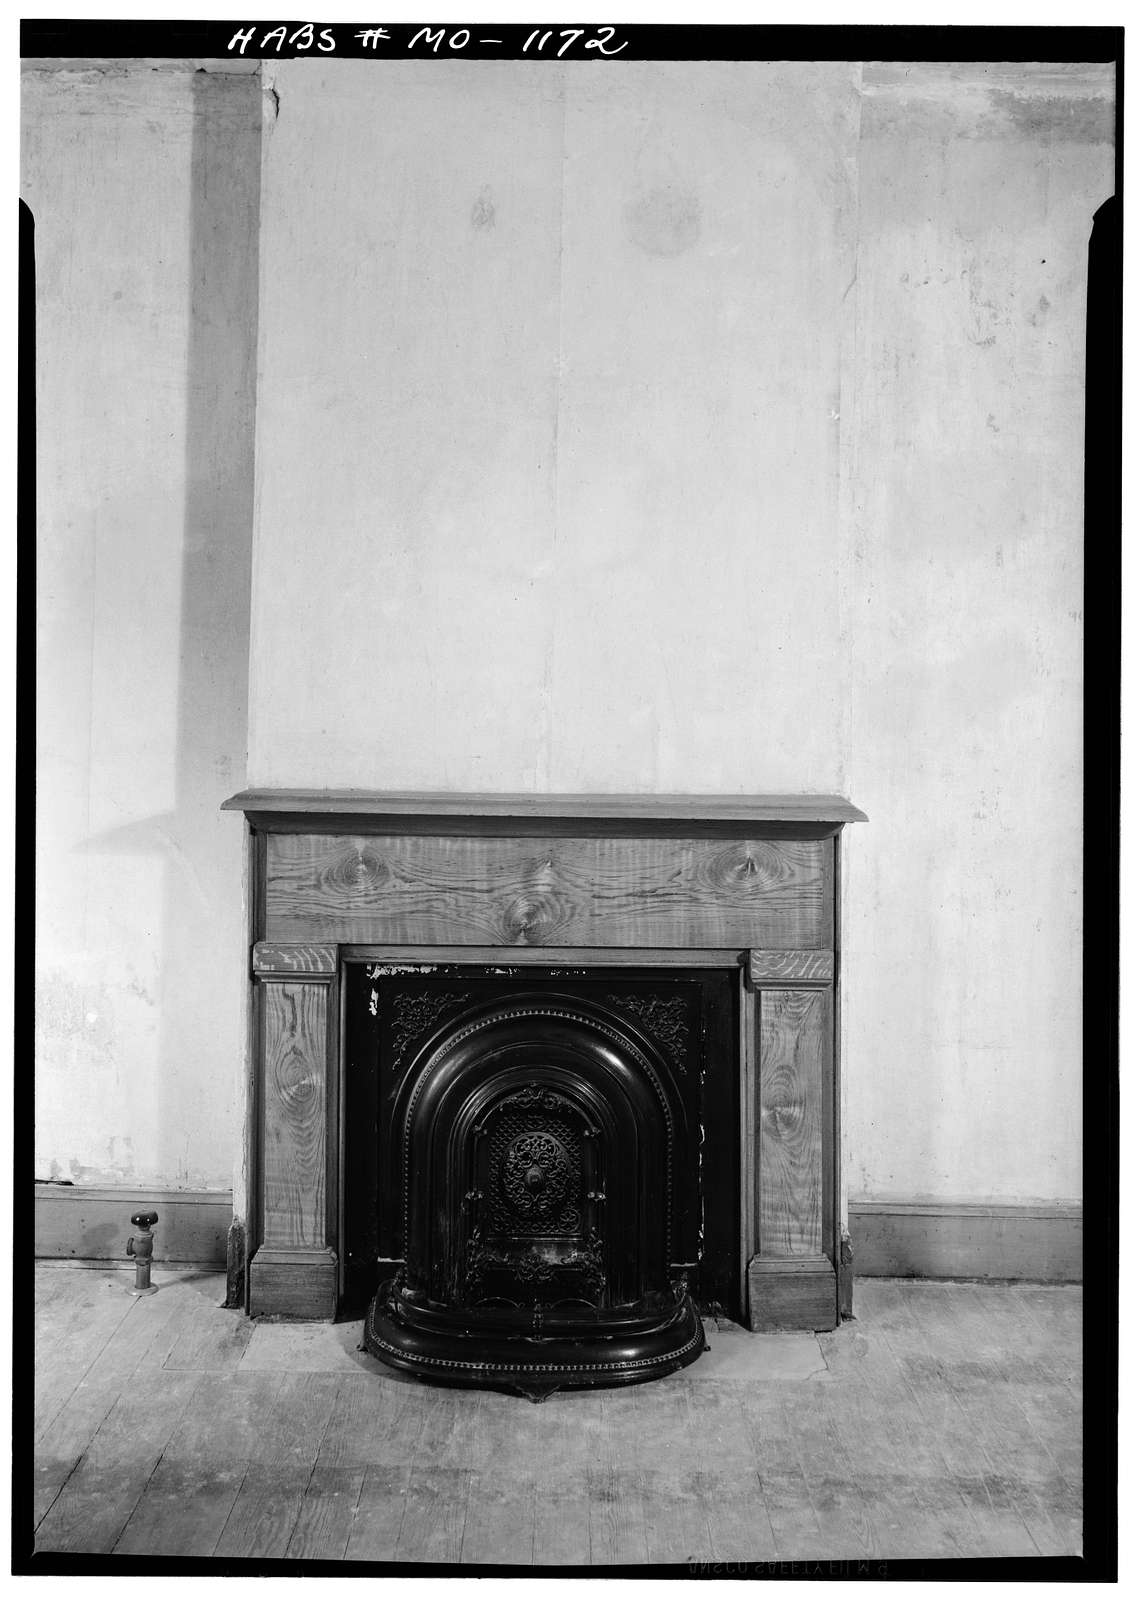 Marine Villa, 3811 Kosciusko Street, South Carondelet (historical), St. Louis County, MO